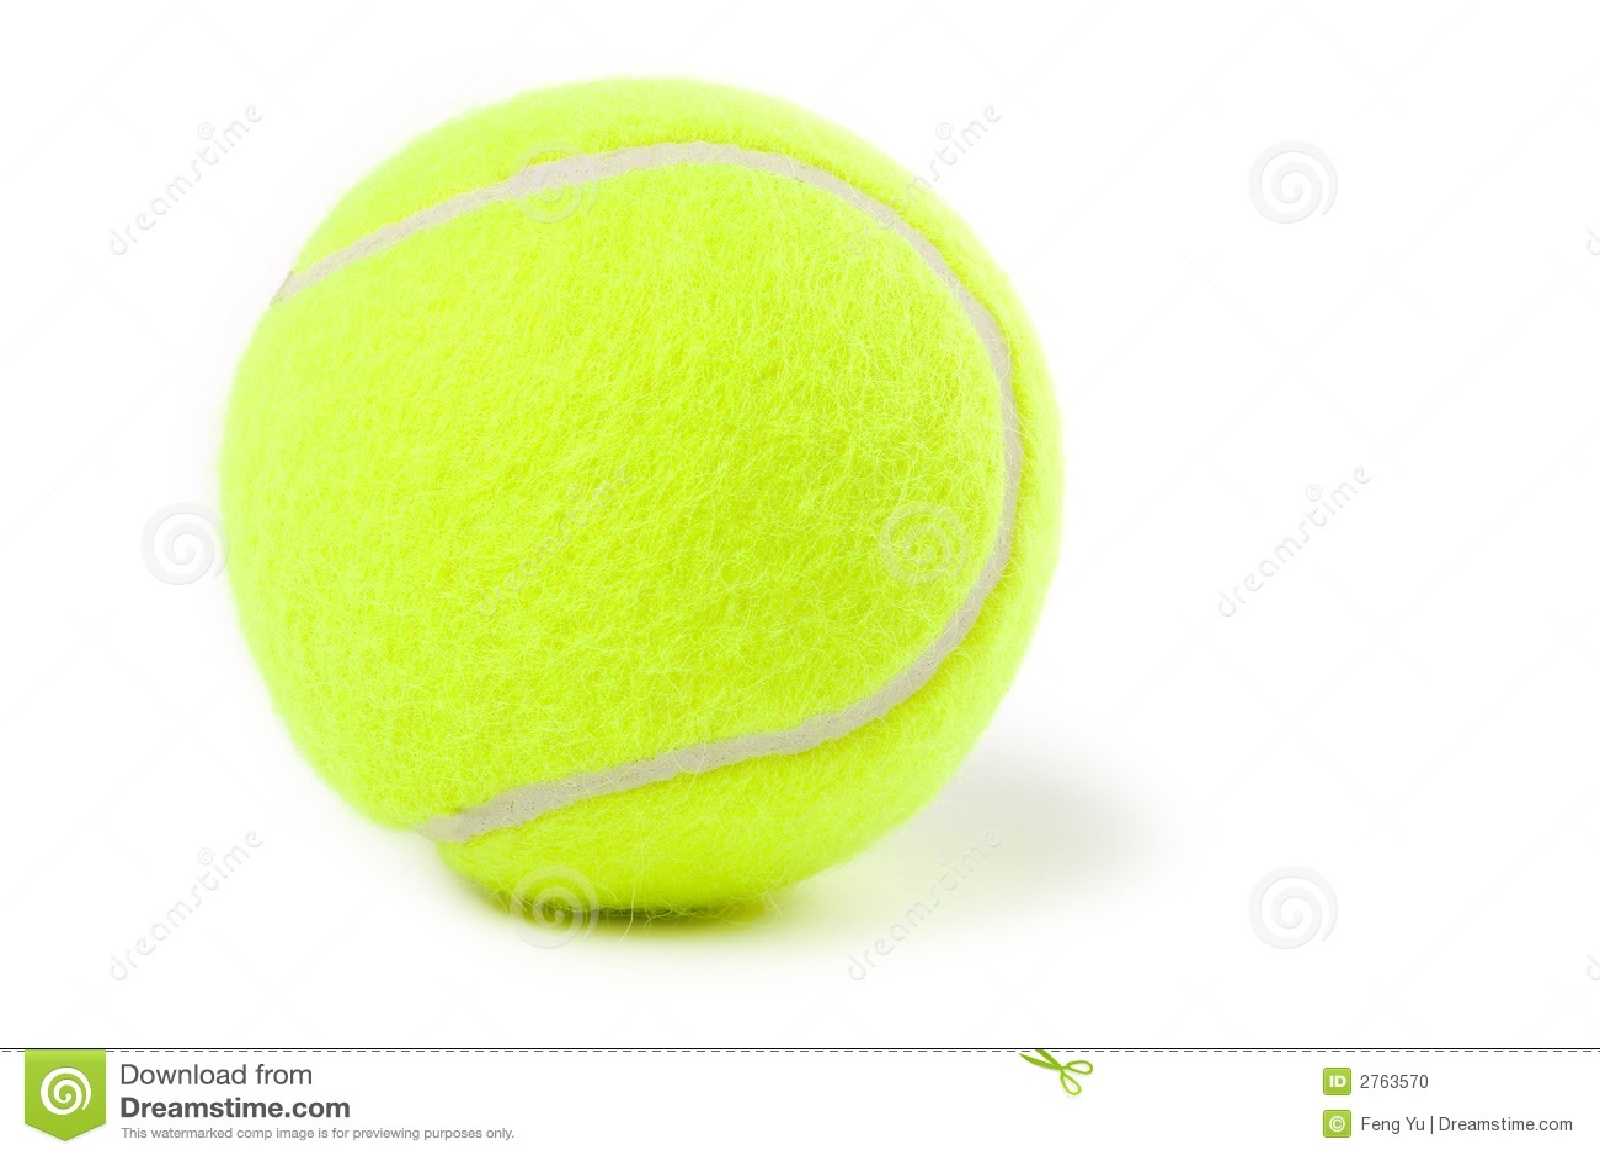 Tennis Balls Stock Photo - Image: 2763570